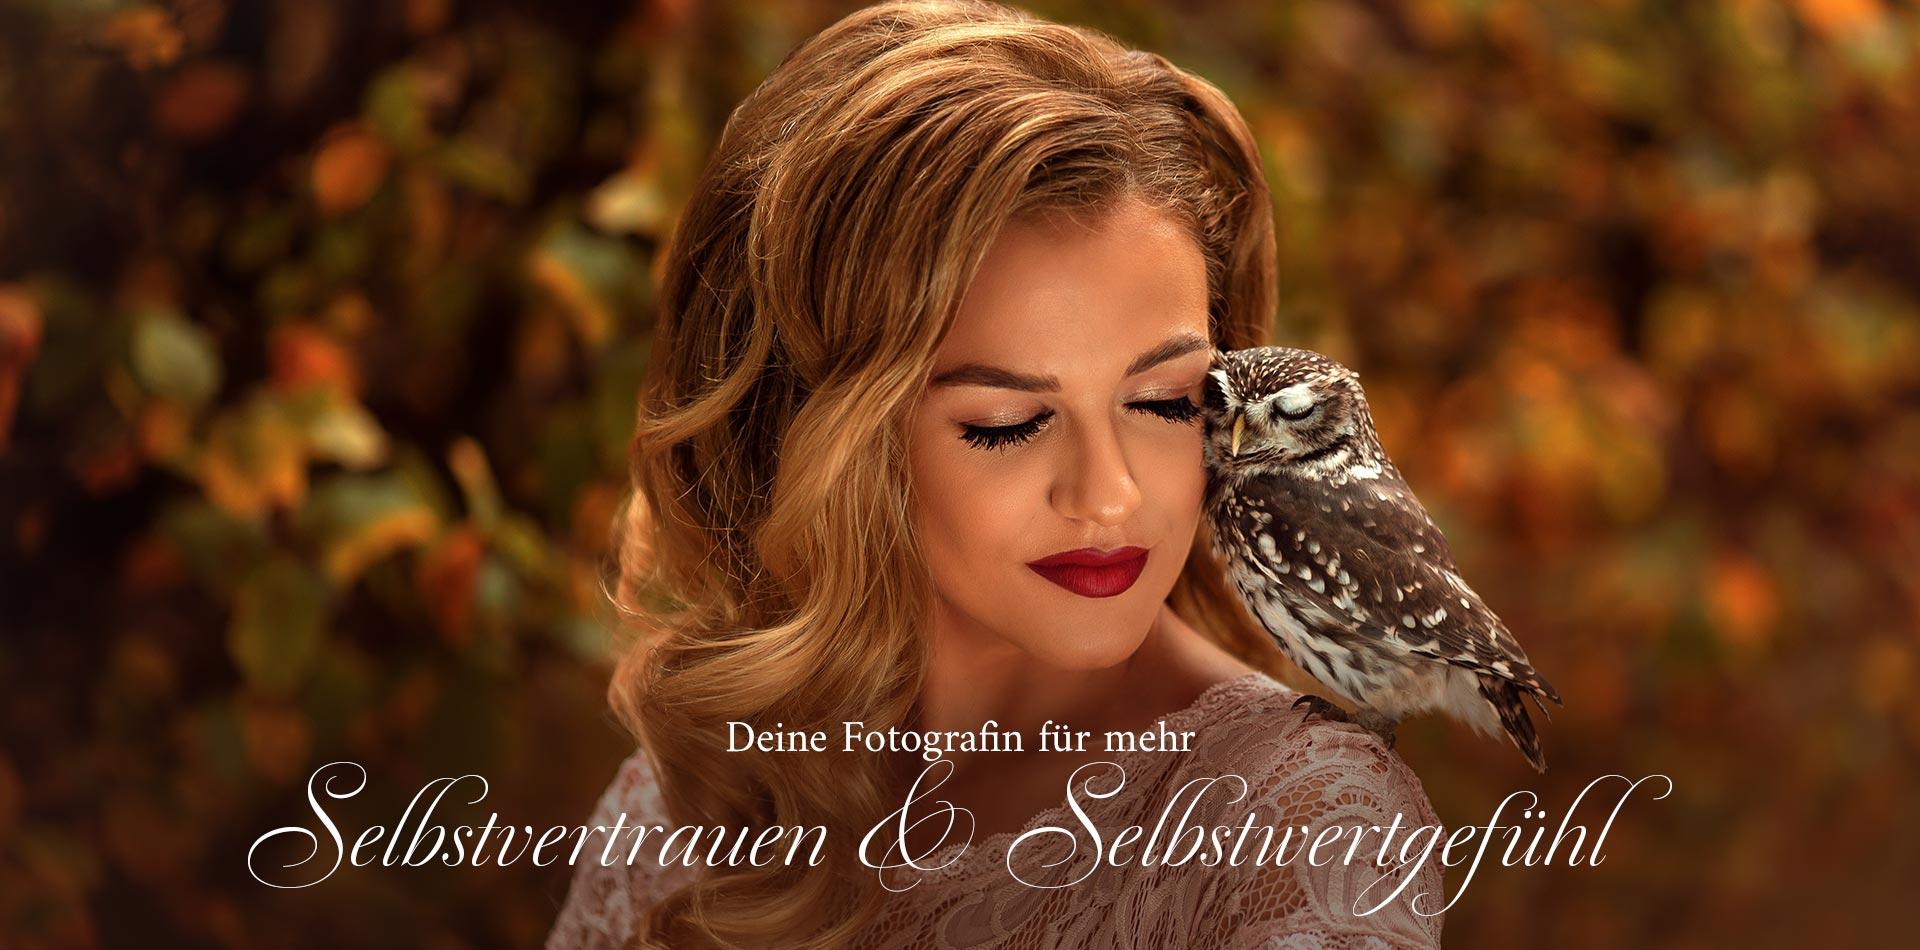 Titelbild | Sarah Böttcher | Fotografin aus Cuxhaven